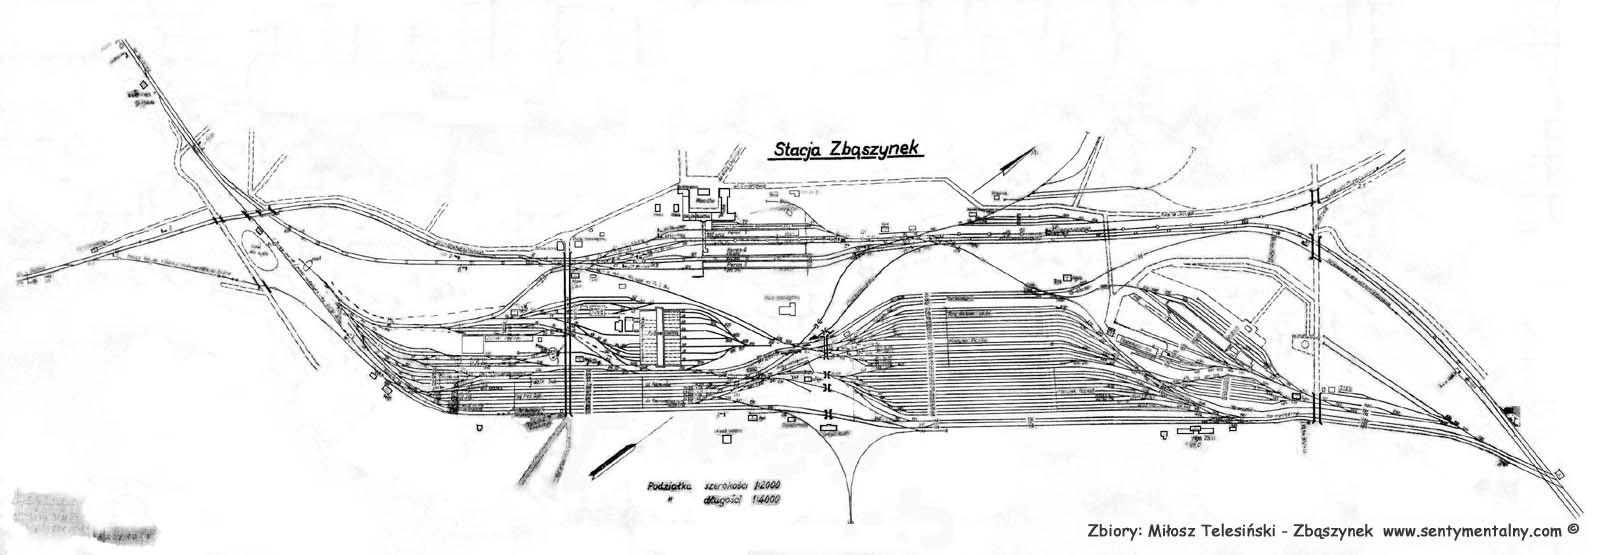 Plan z 1941 roku